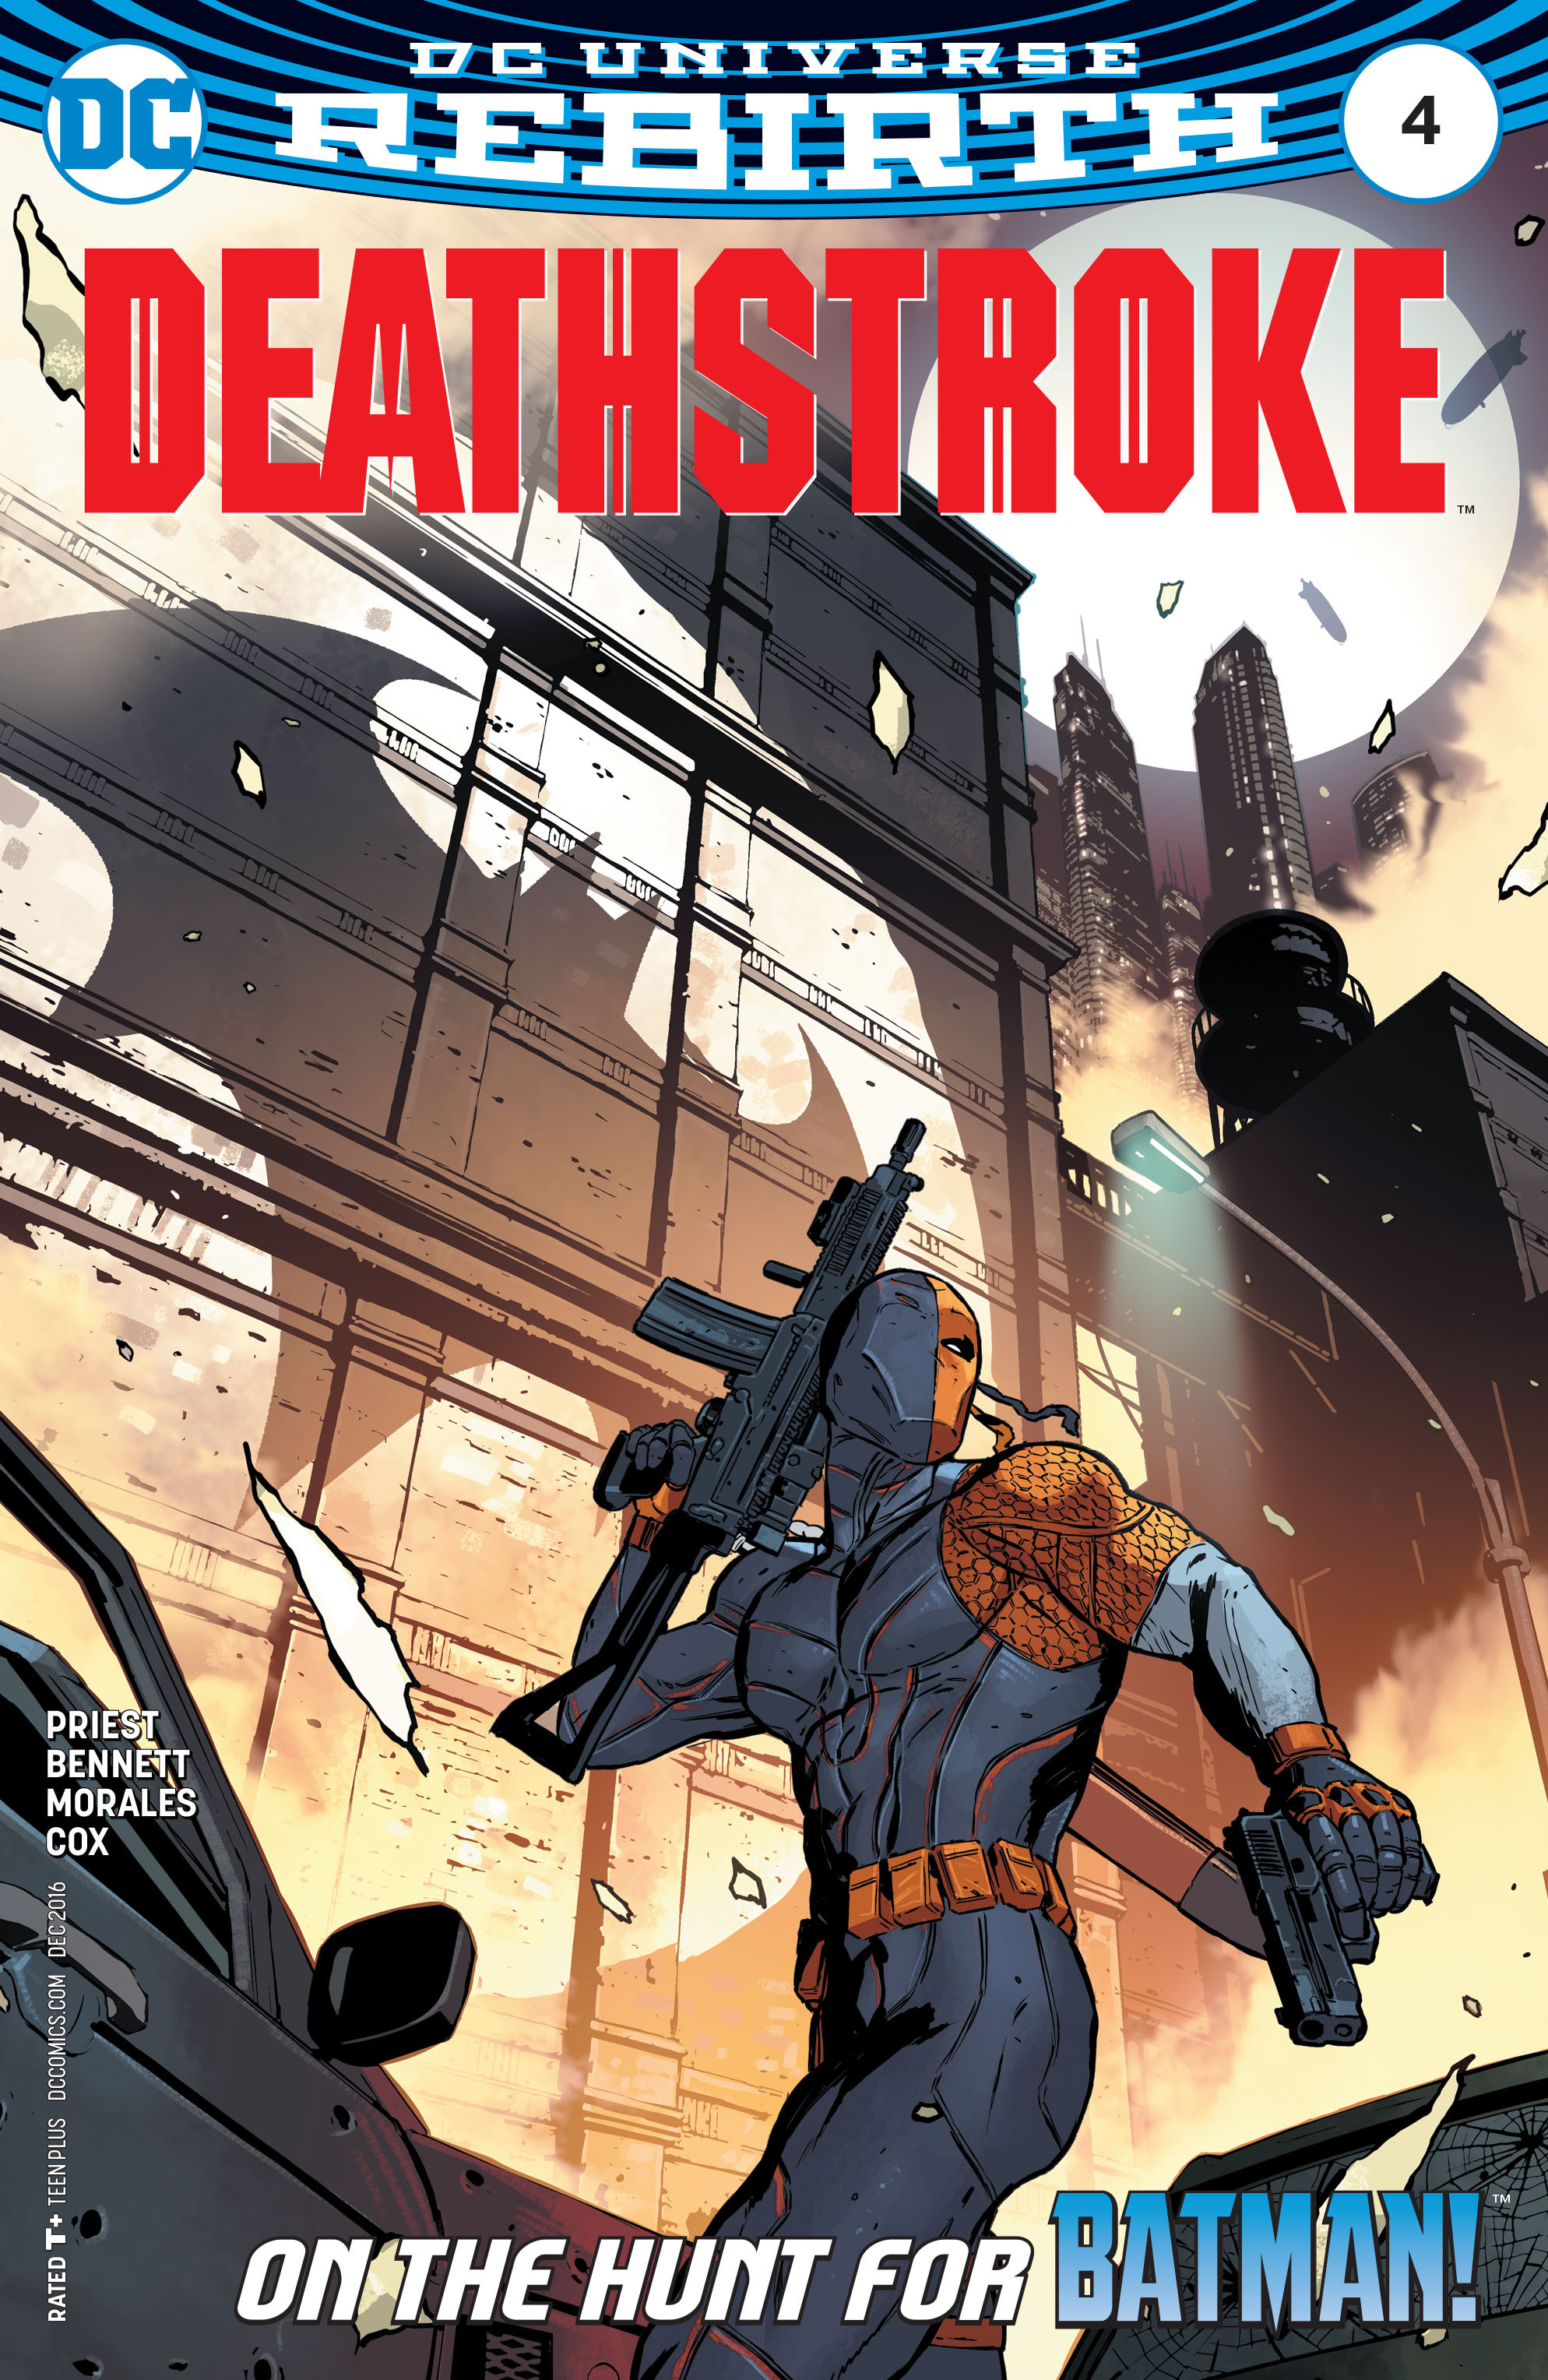 Deathstroke (2016) 4 Page 1